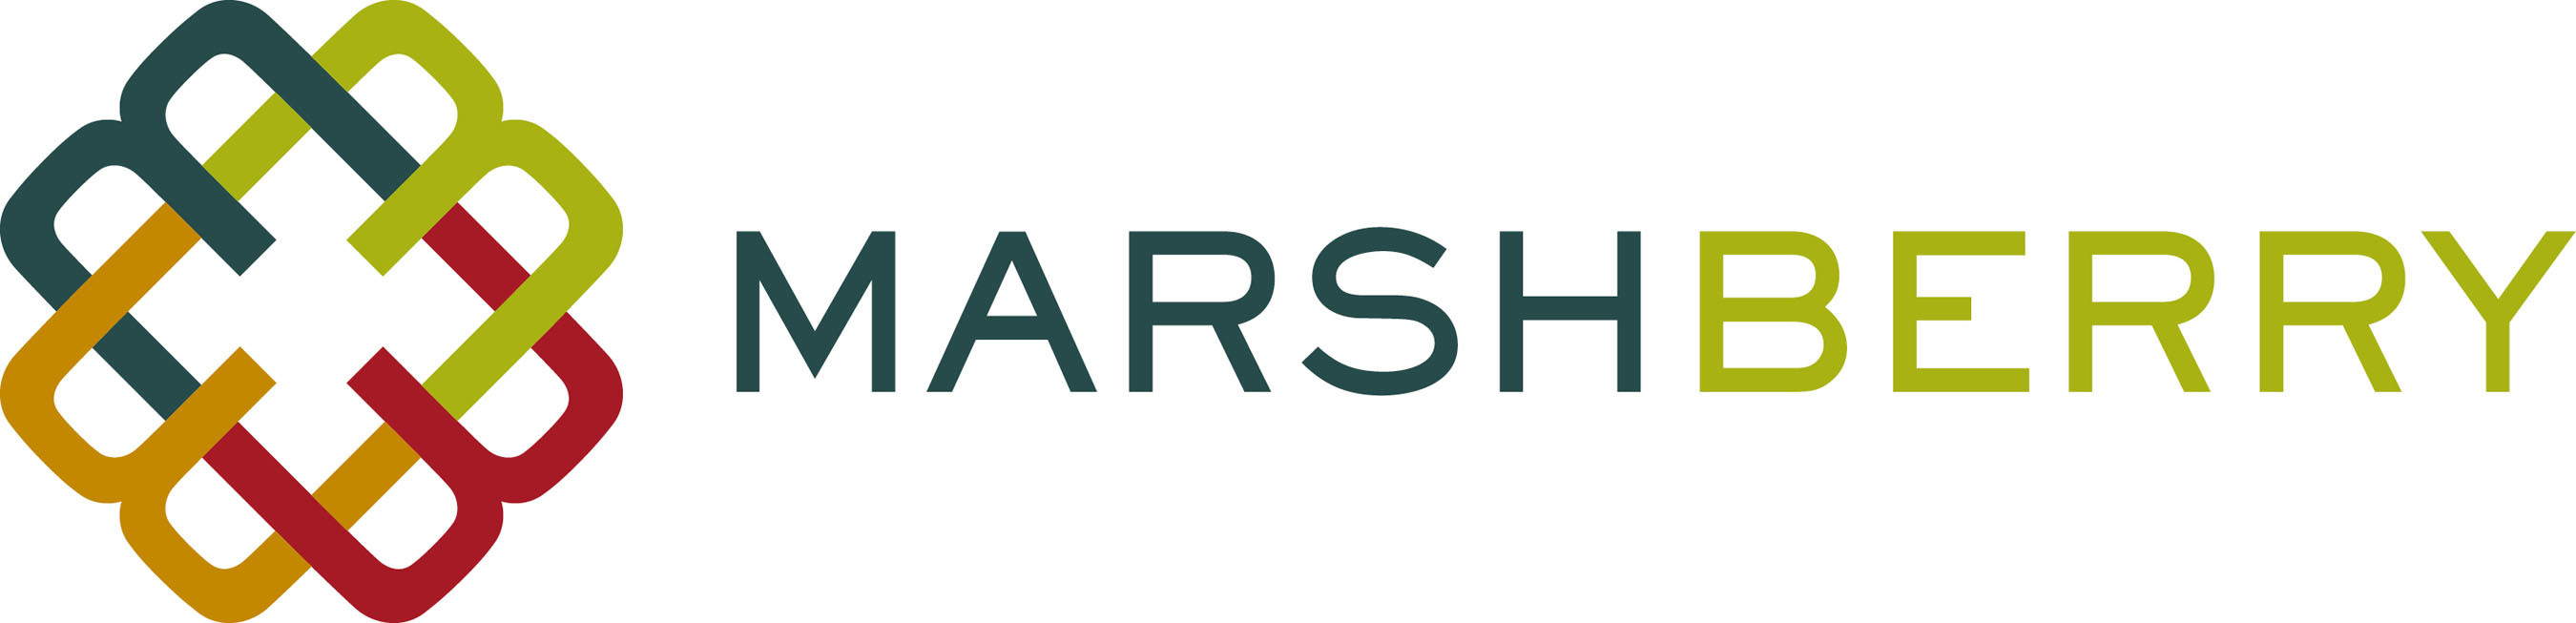 MarshBerry logo